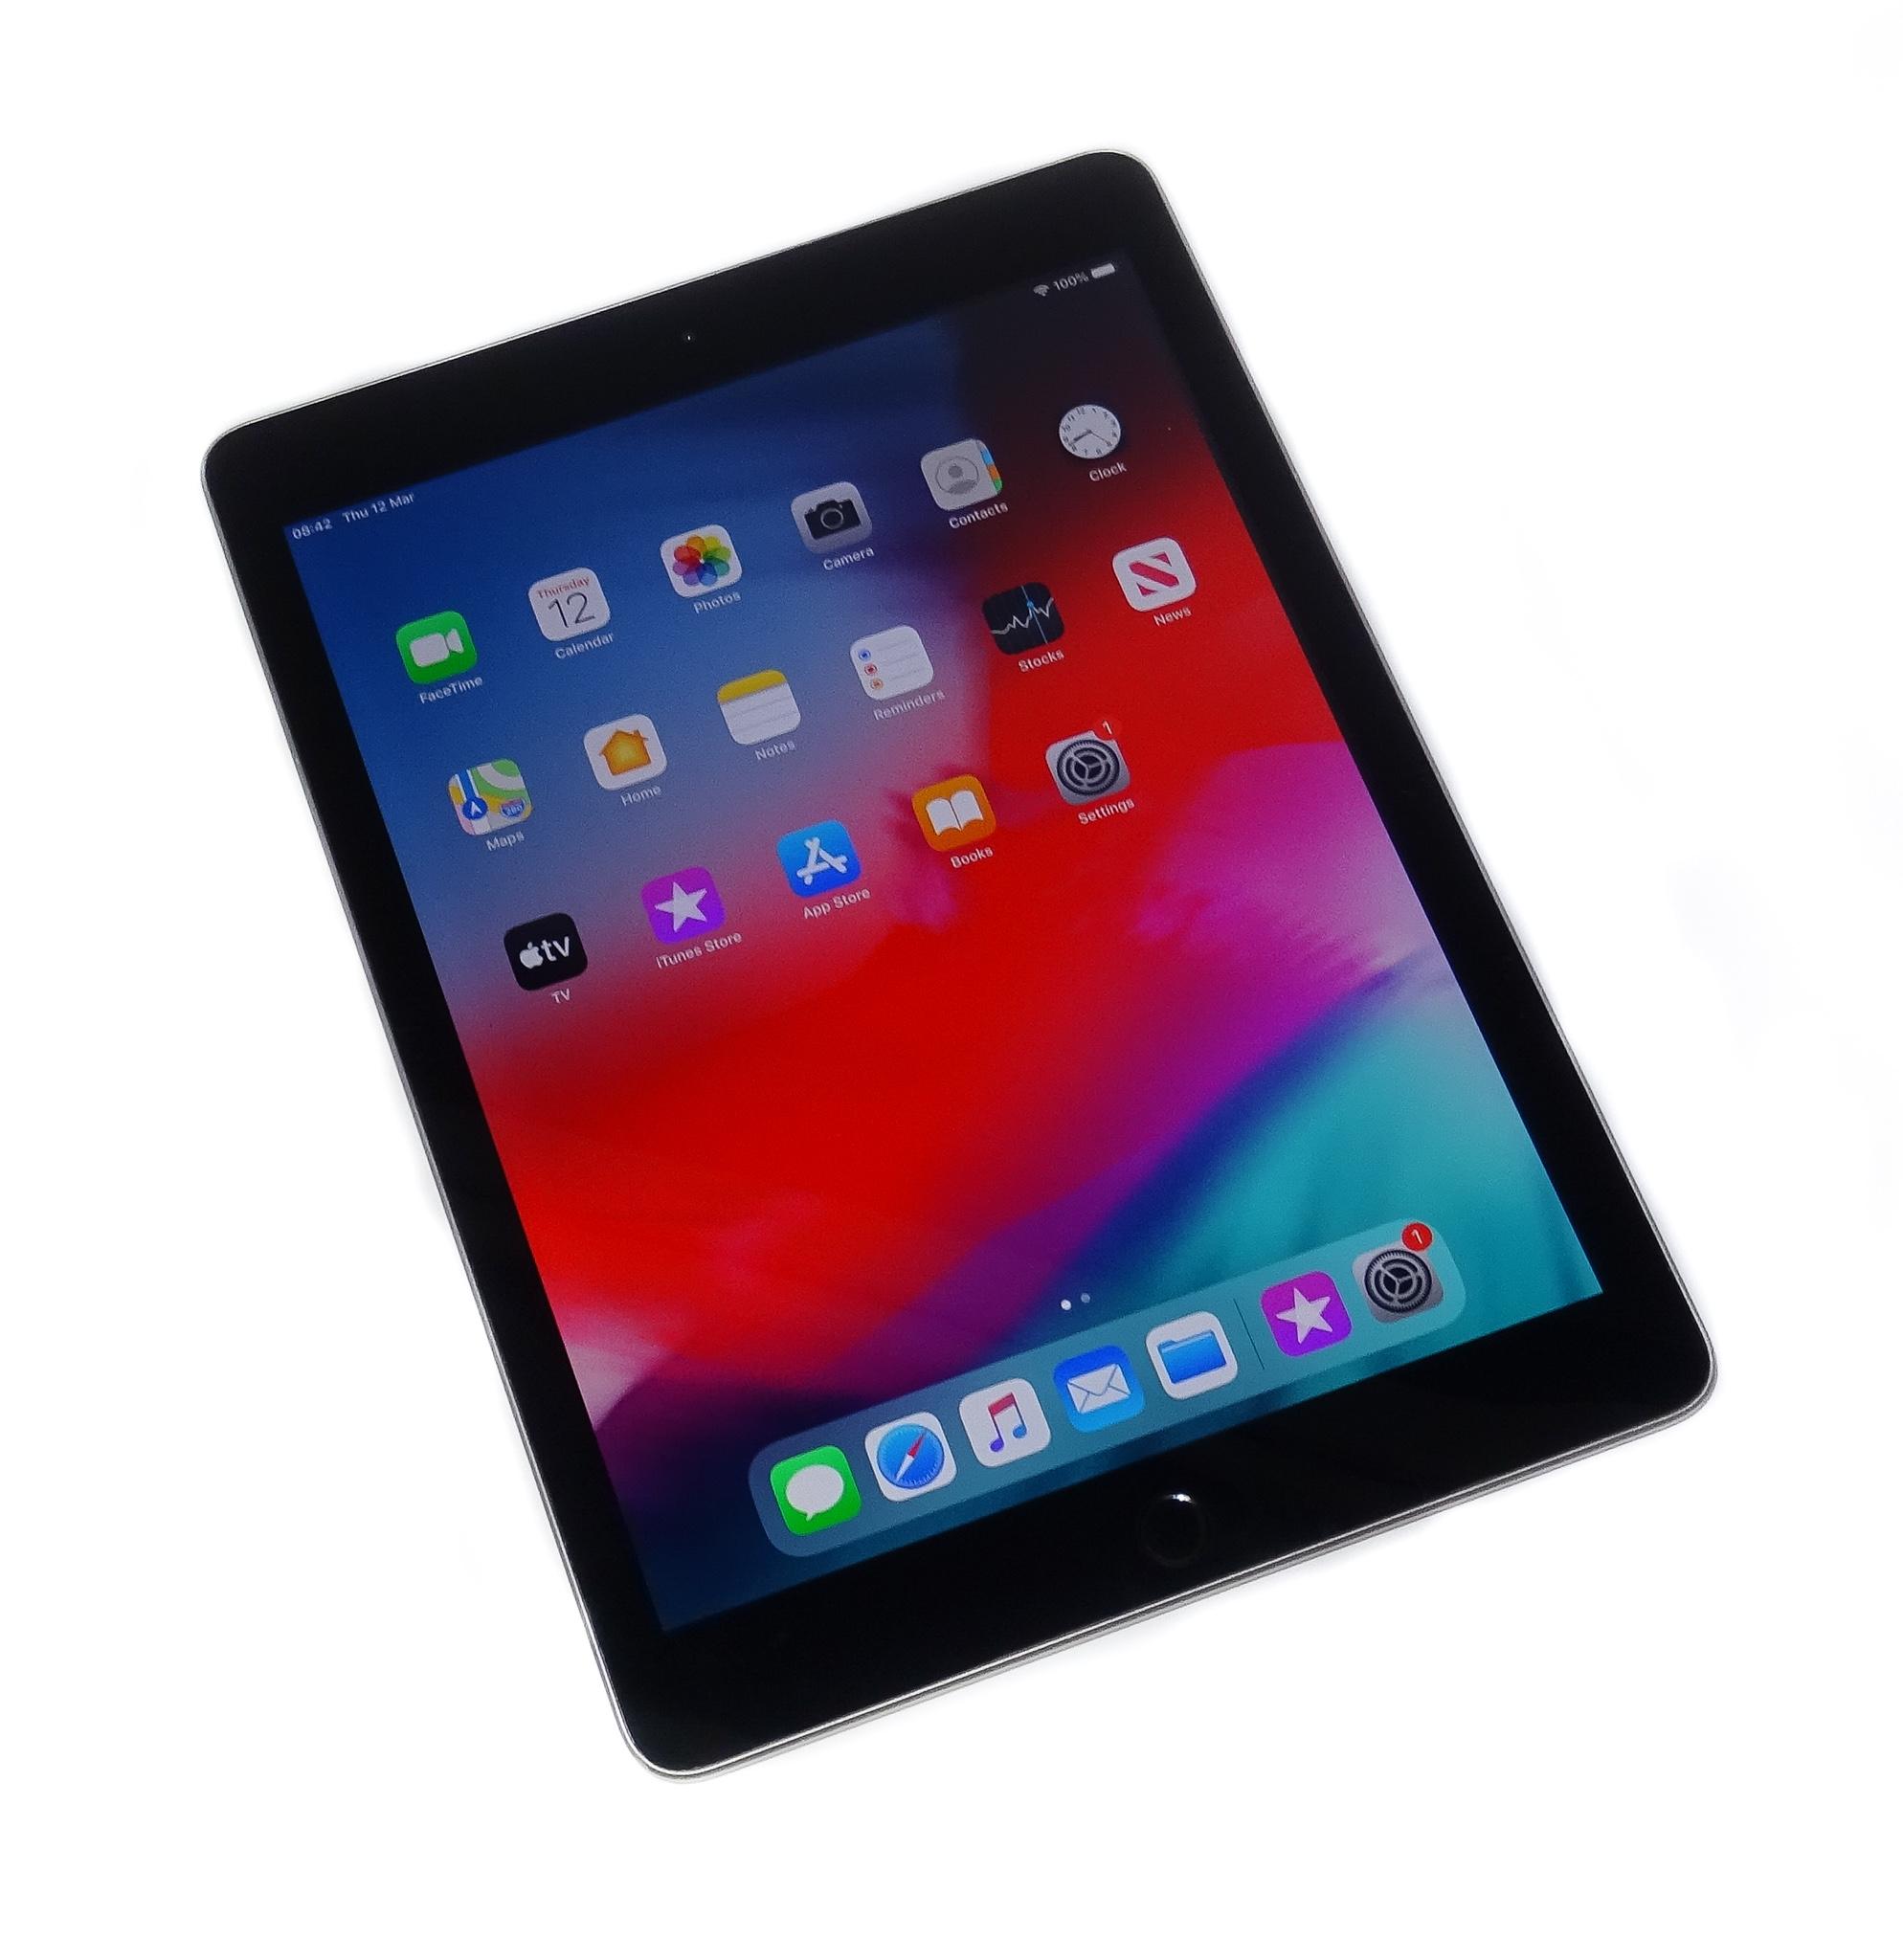 Apple iPad 5th Gen. A1822 - 32GB / WiFi / Space Grey